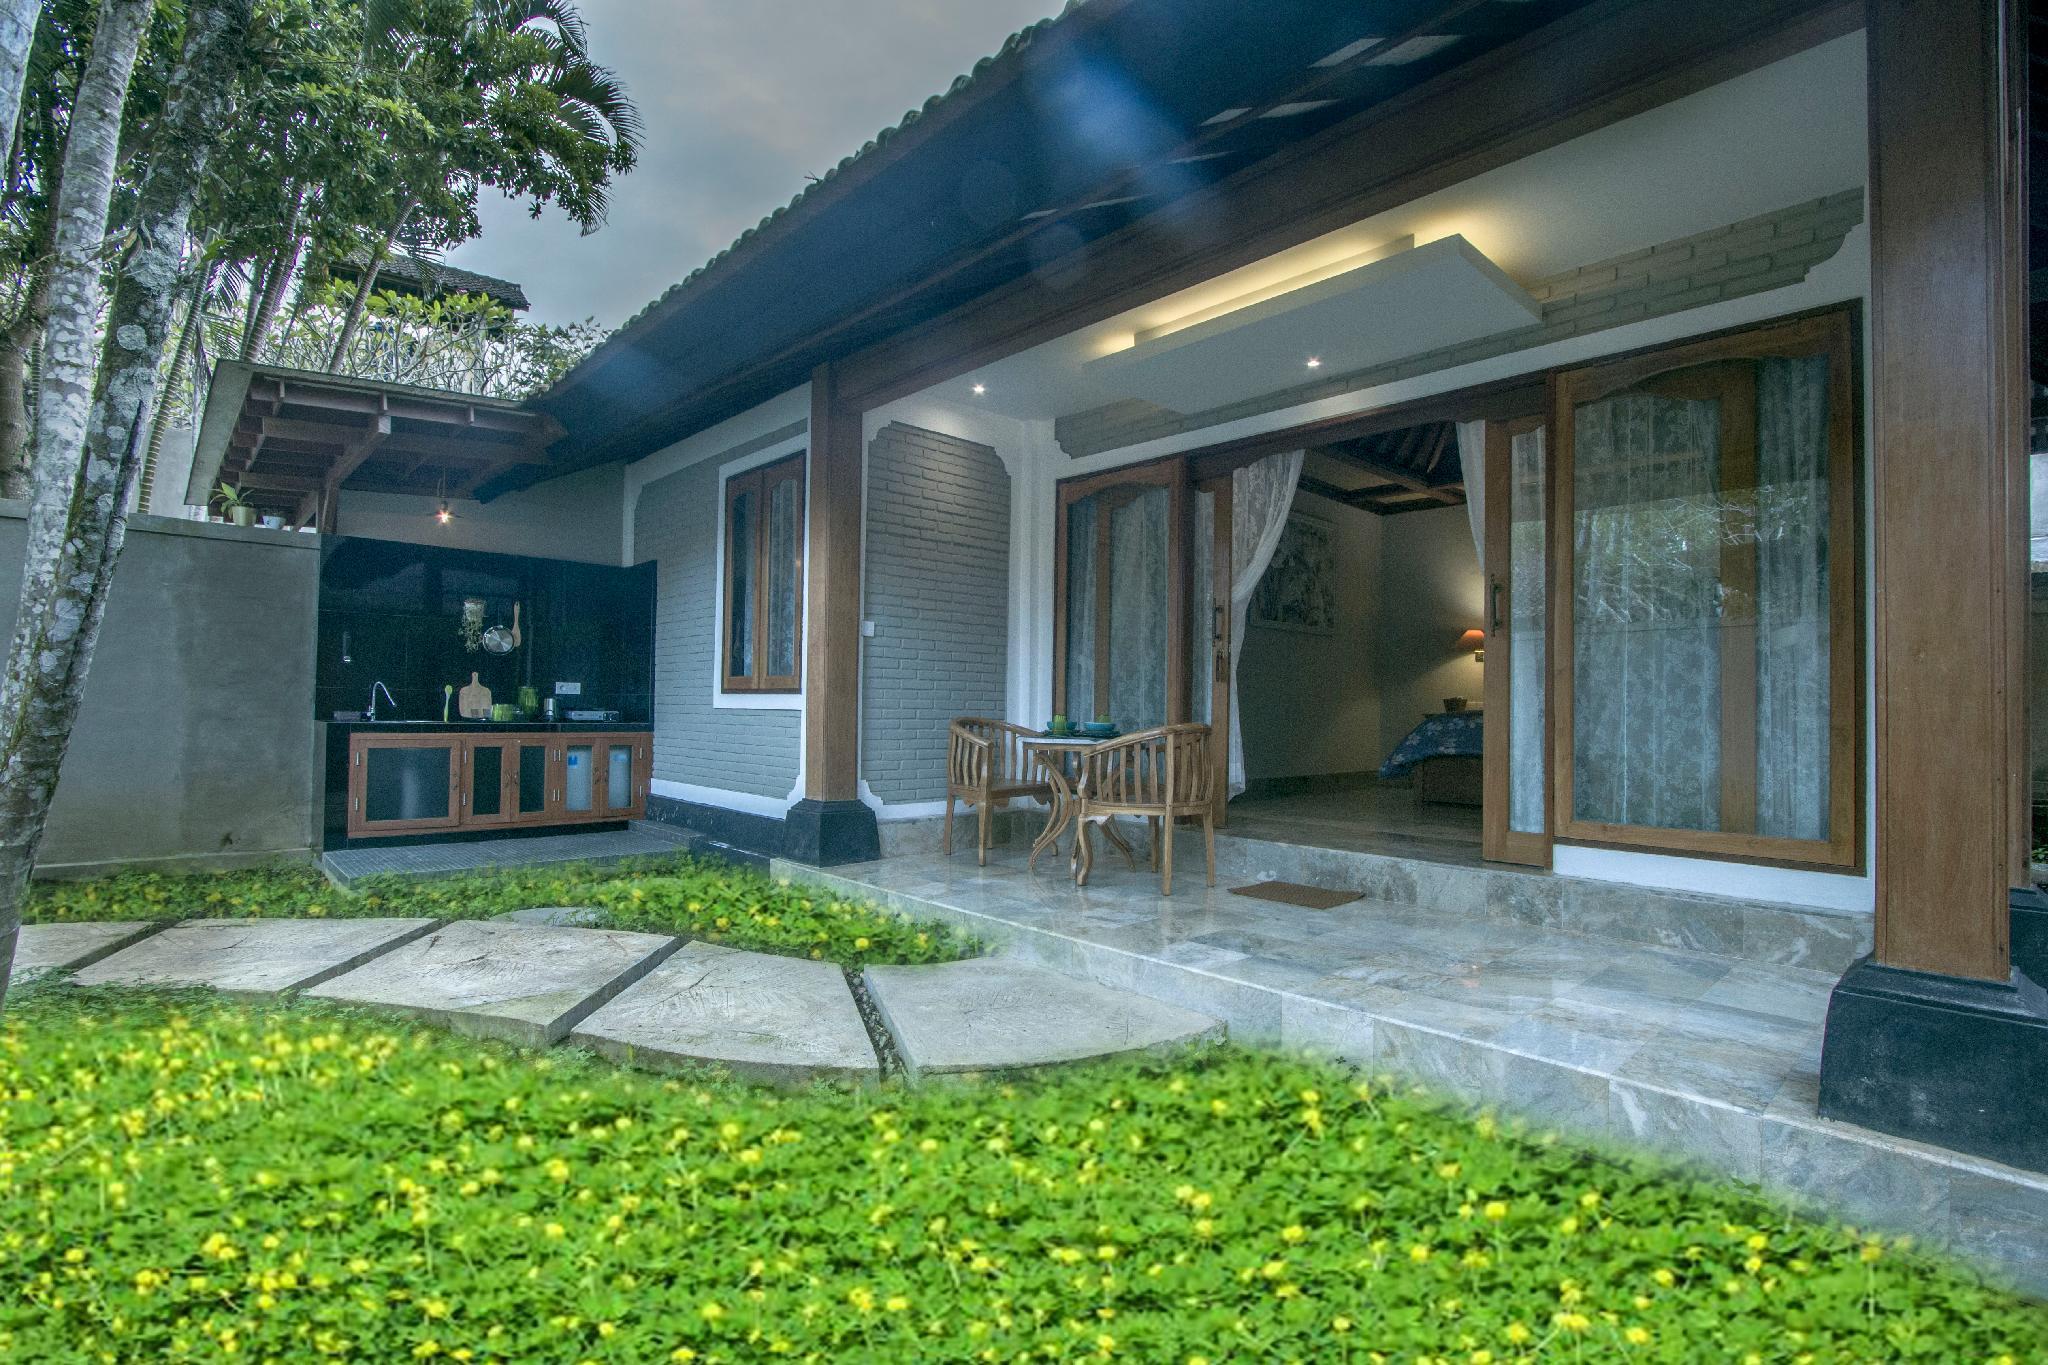 Villa 5 1BR Fancy Villa With Public Pool At Ubud